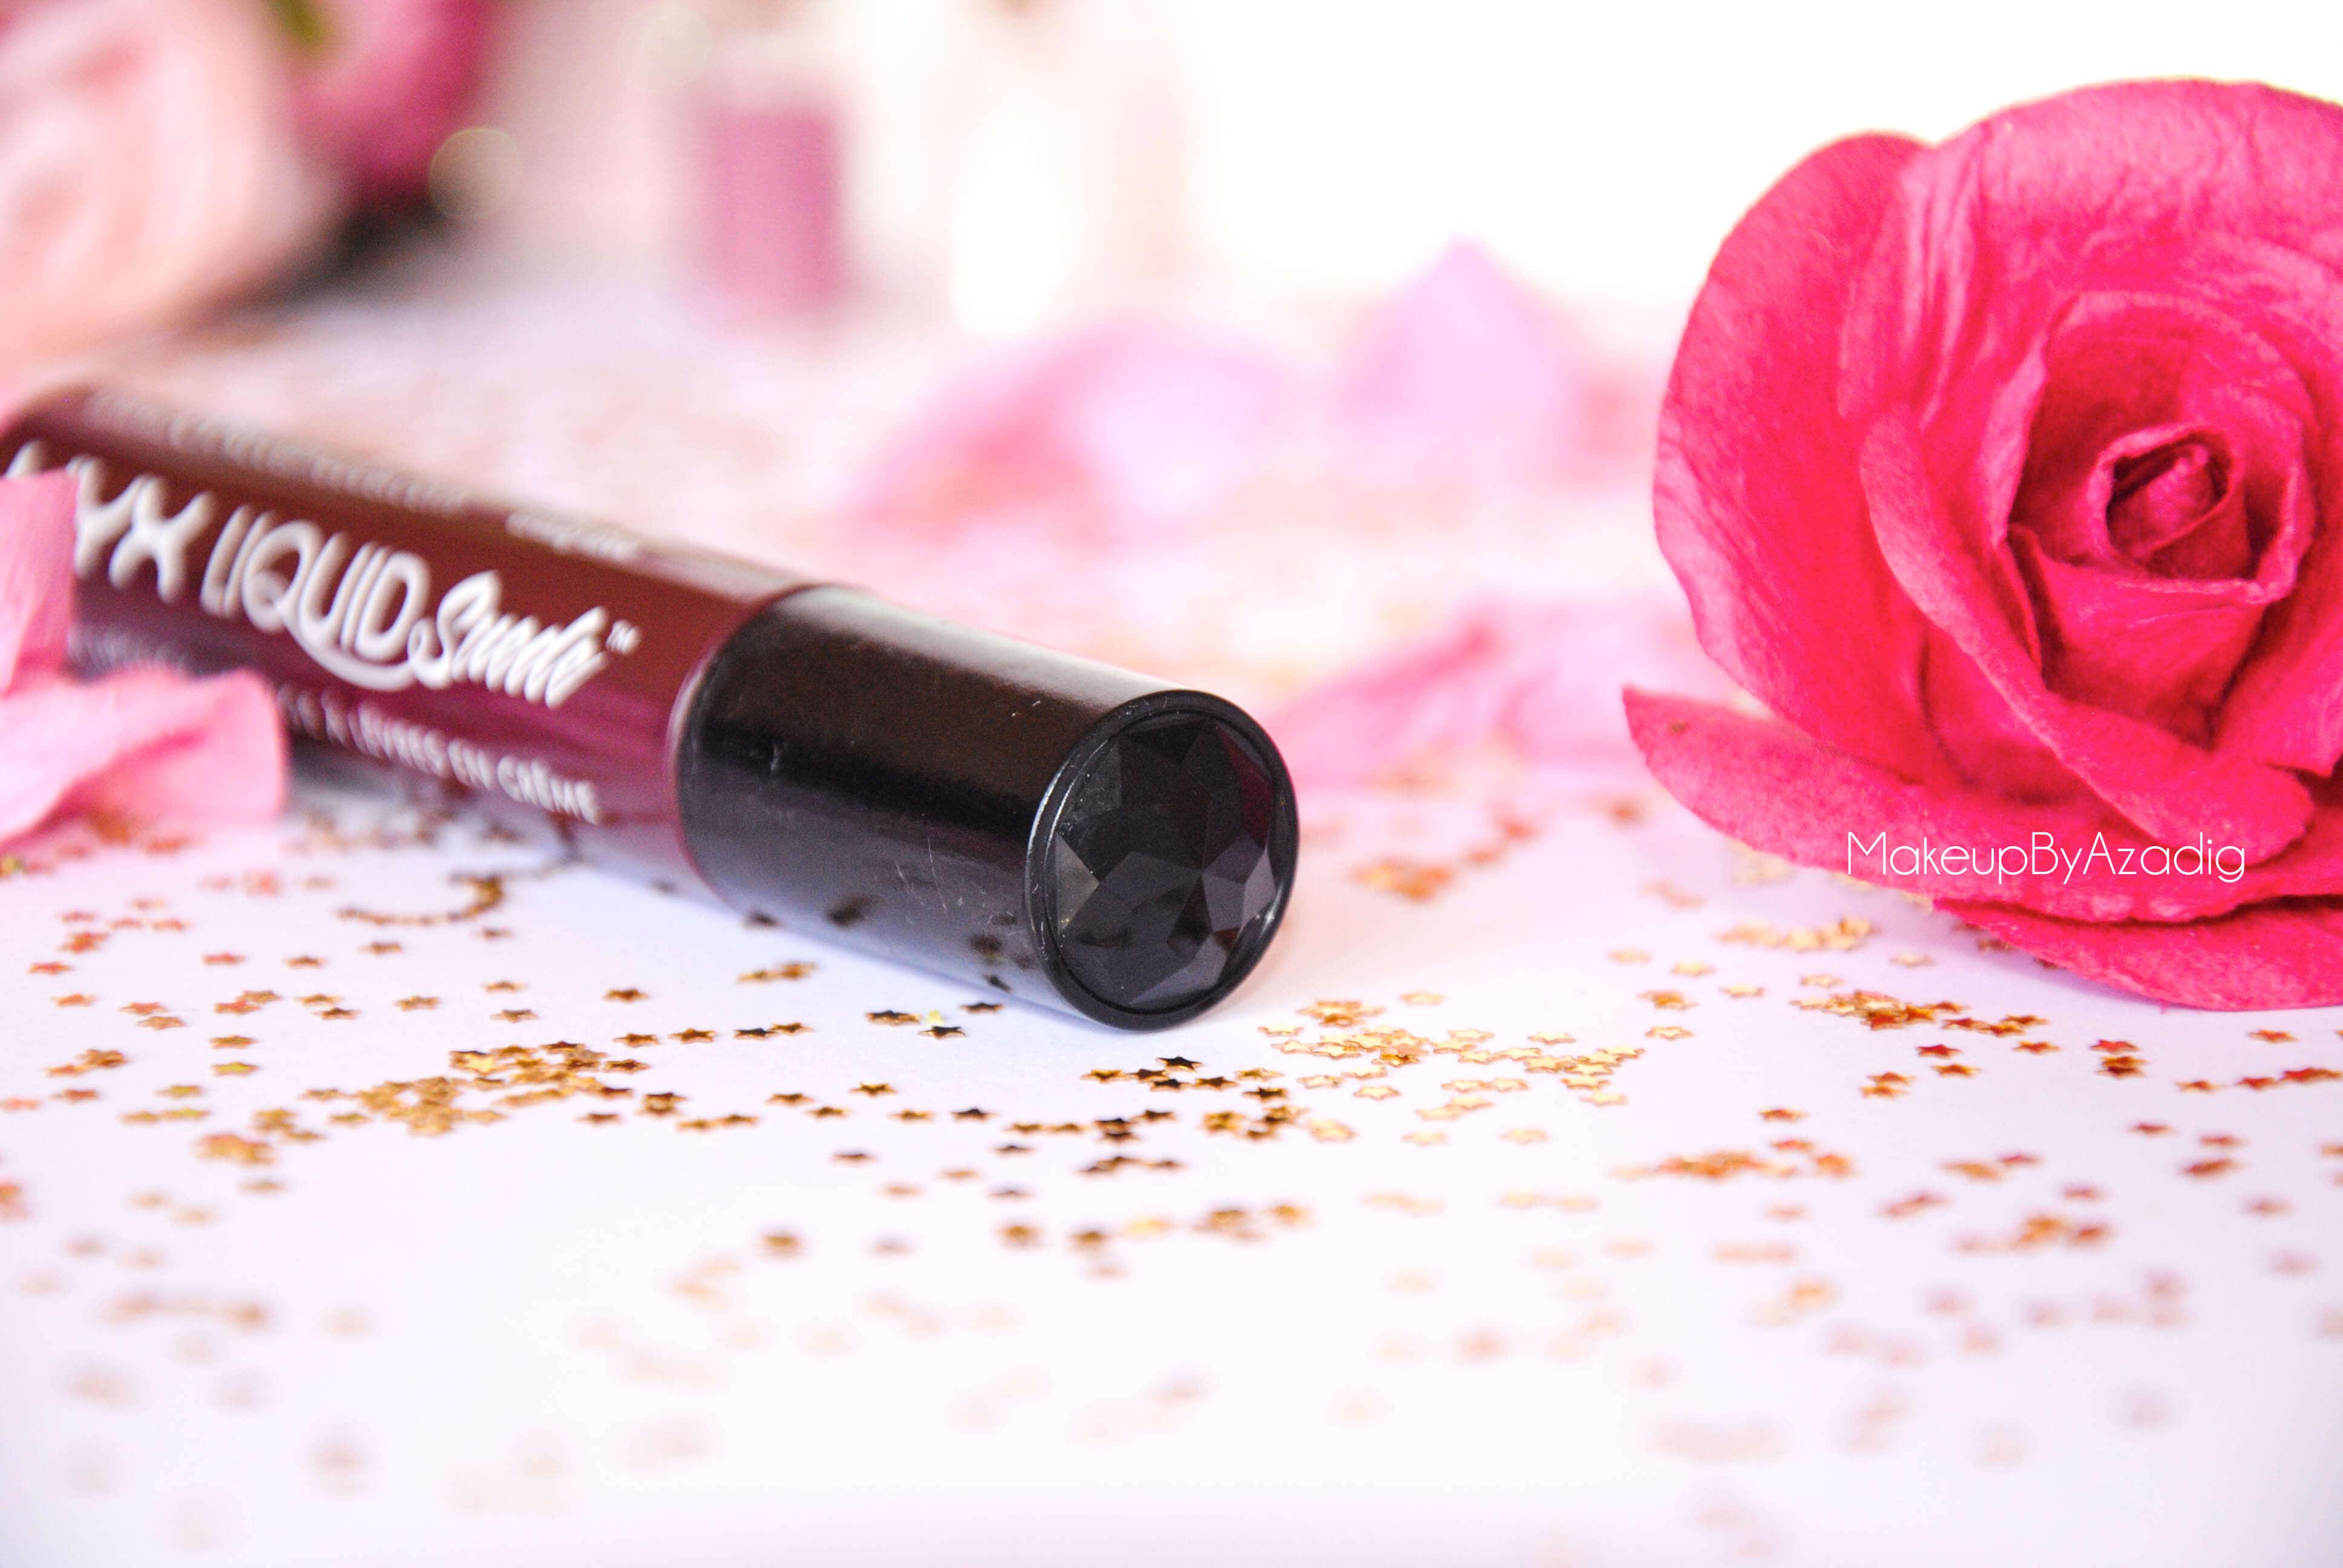 liquid suede-makeupbyazadig-swatch-nyx-cosmetics-pink lust-sway-stone fox-soft spoken-orange cunty-sandstorm-amethyst-lipstick-sway-cherry skies-vintage-diamant